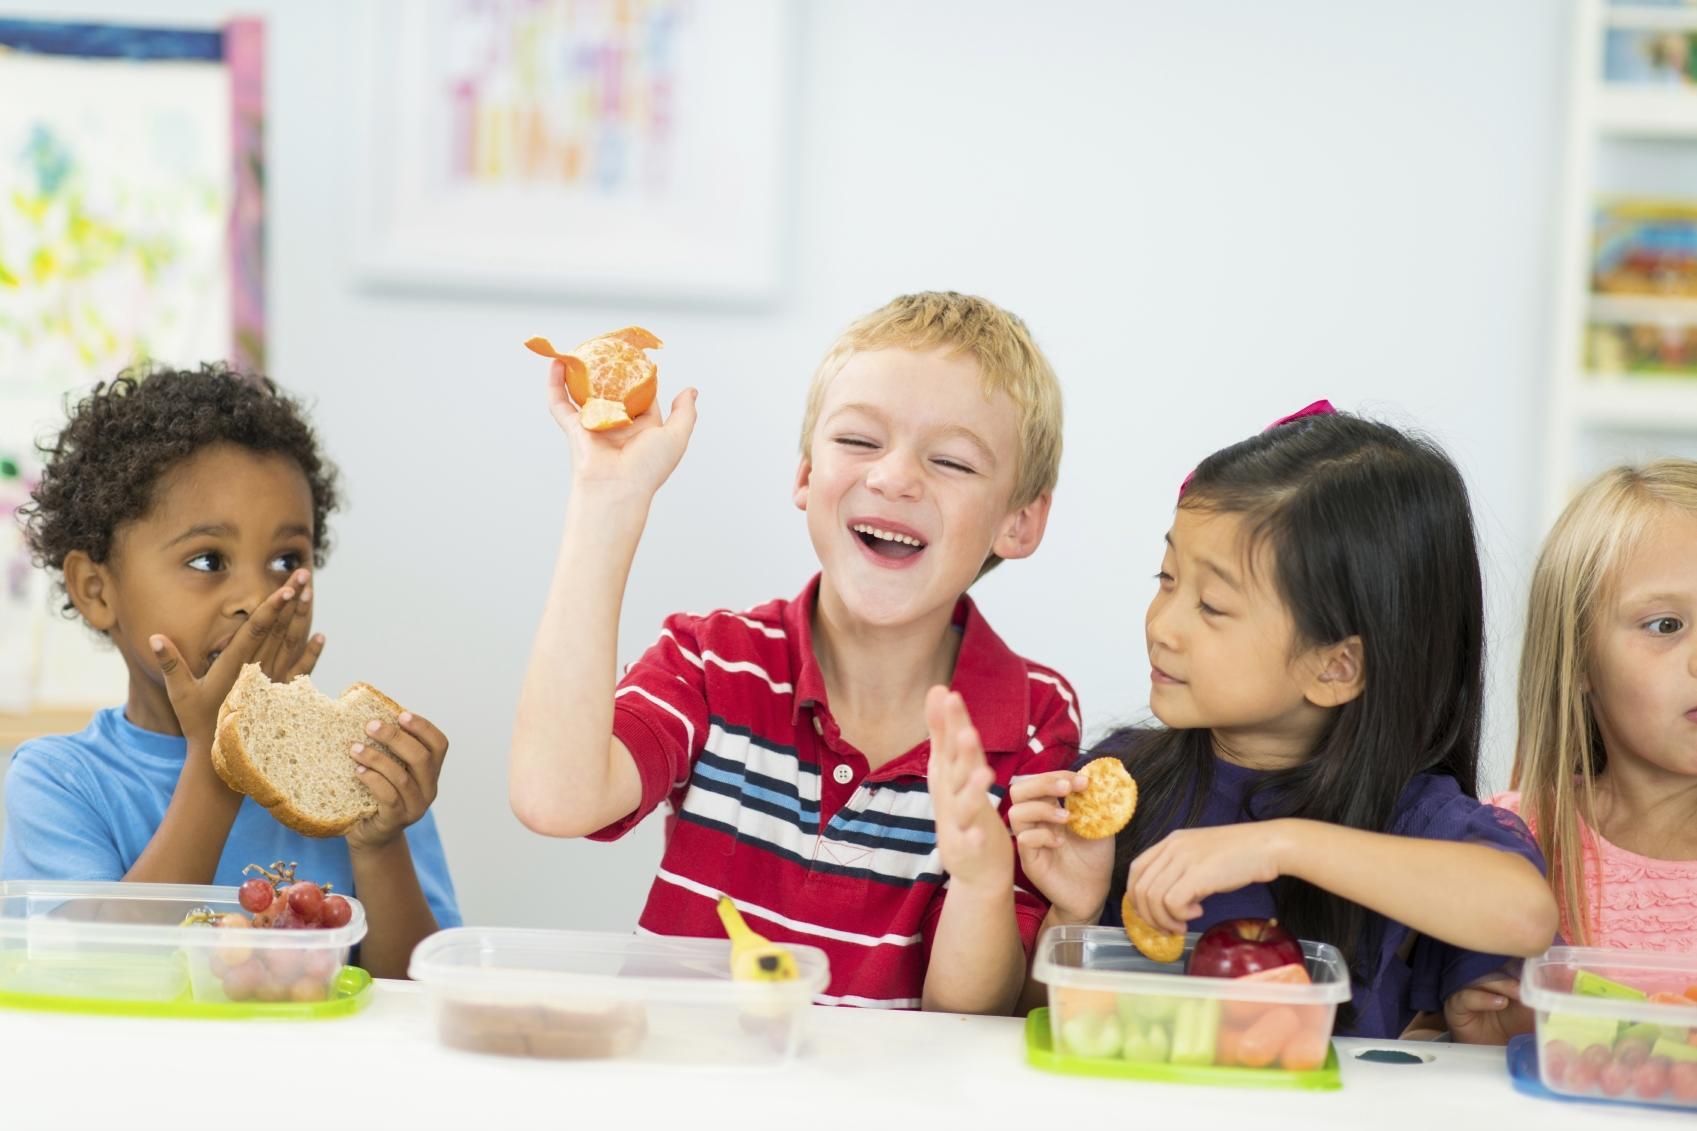 5 Ways To Help Your Kids Choose Healthy Snacks